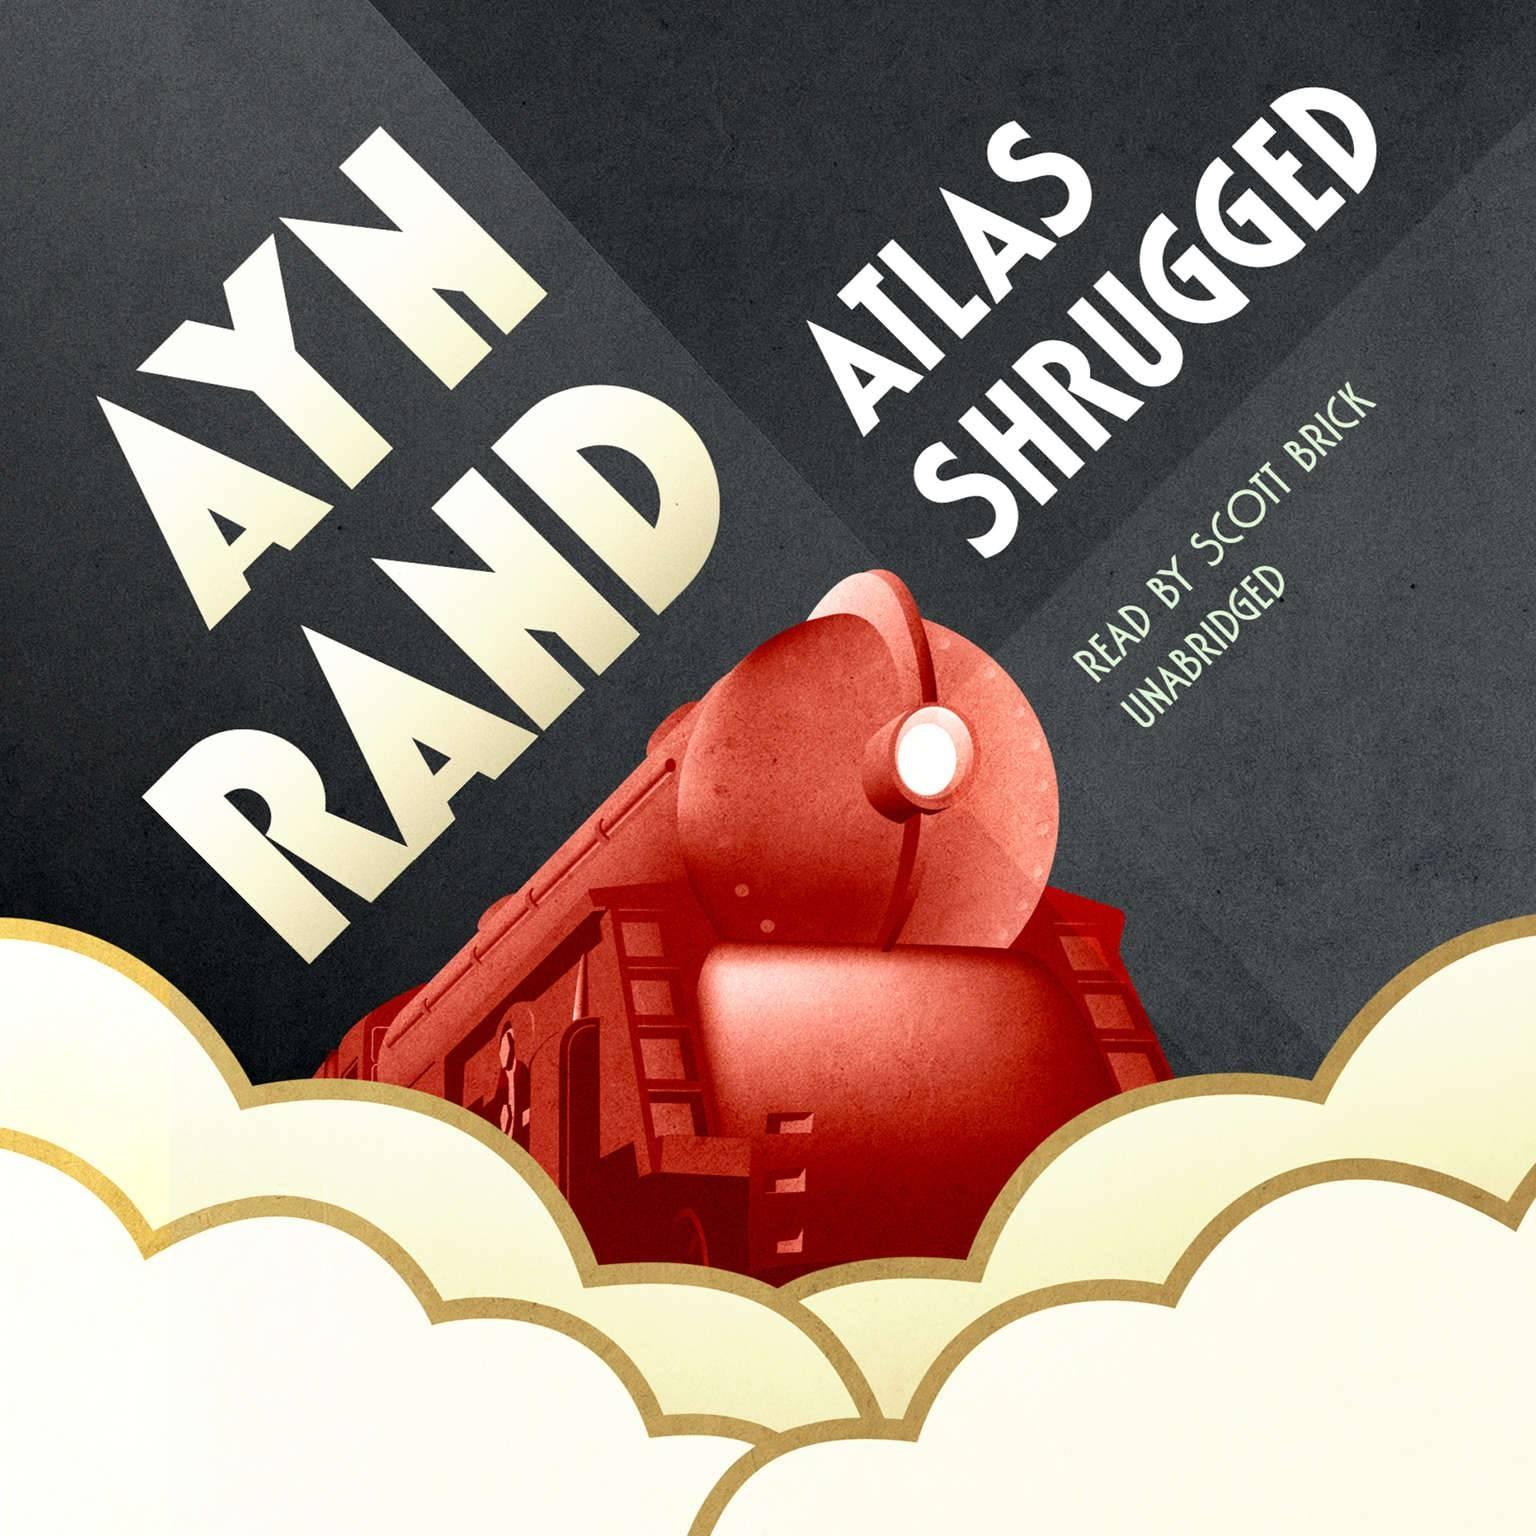 Download Atlas Shrugged Audiobookayn Rand Readscott Brick Regarding 2017 Atlas Shrugged Cover Art (View 16 of 20)